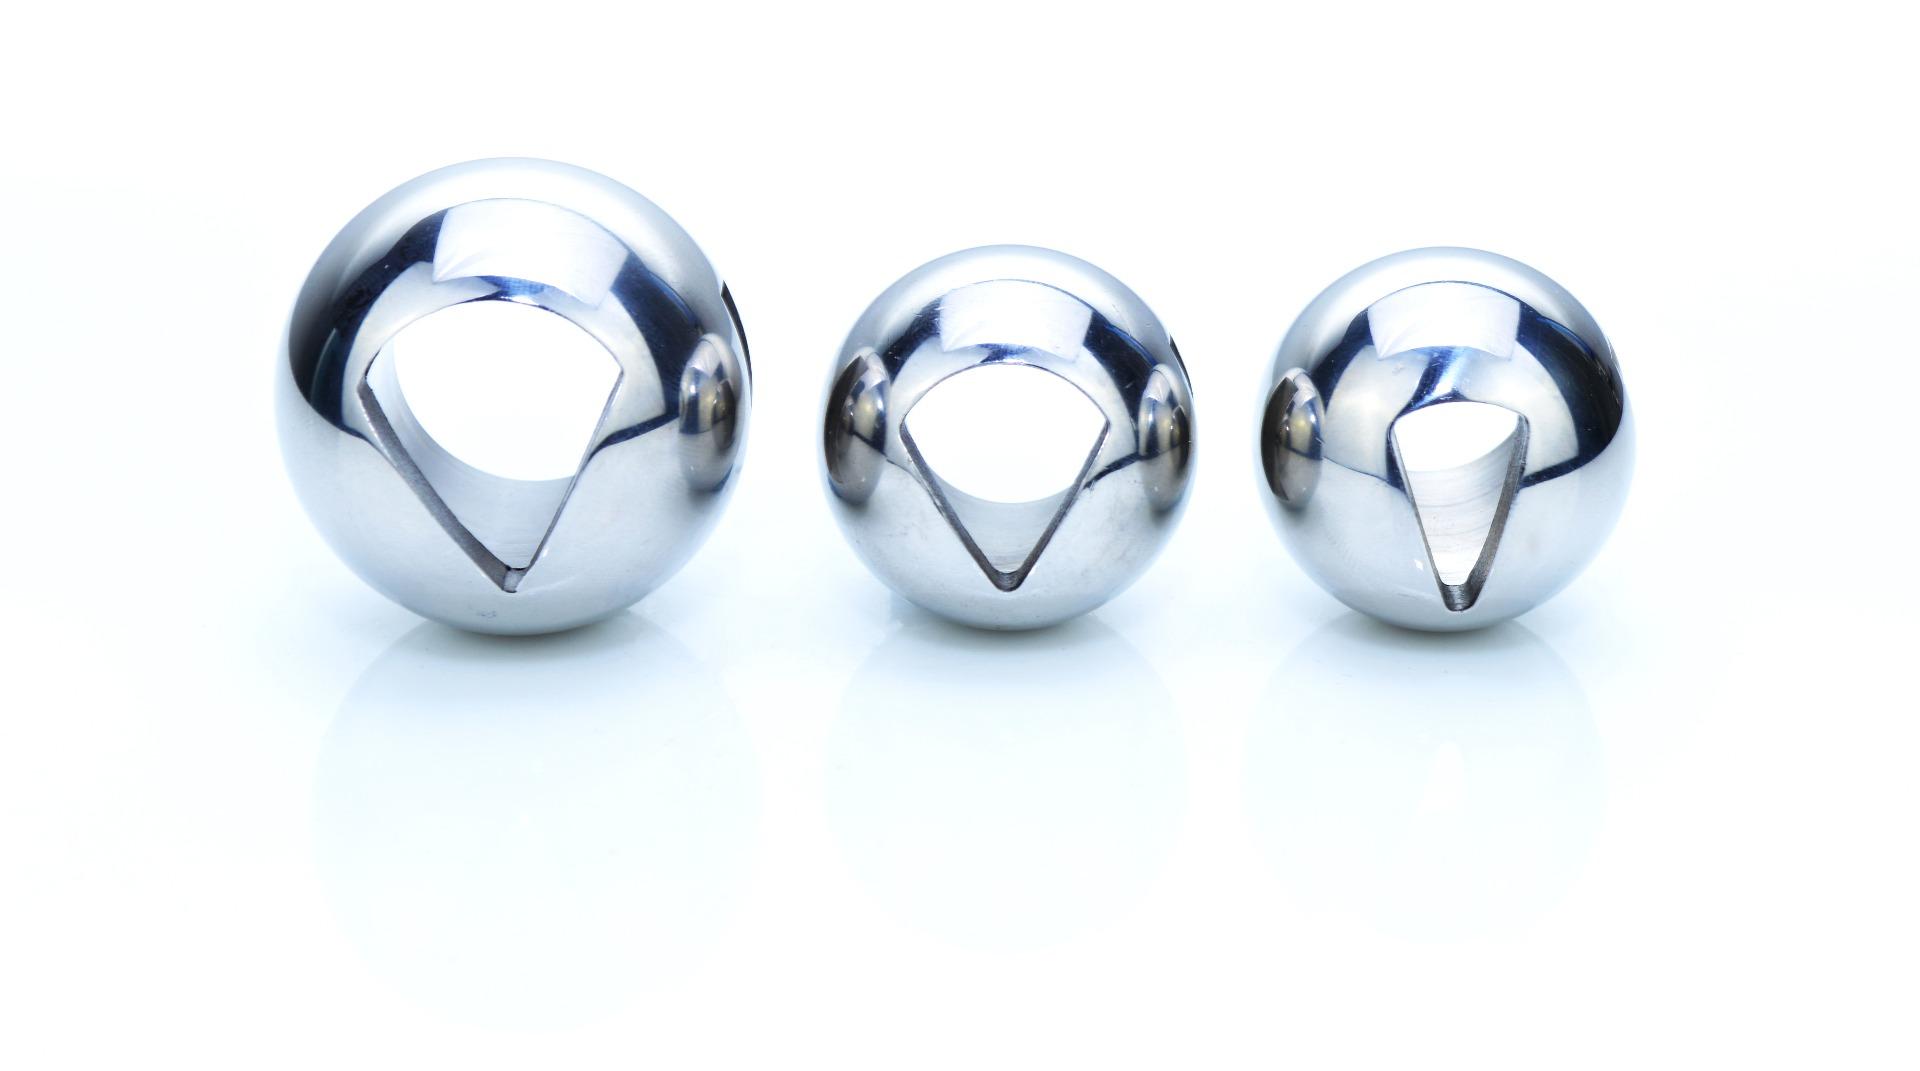 V-sector balls from a ball valve